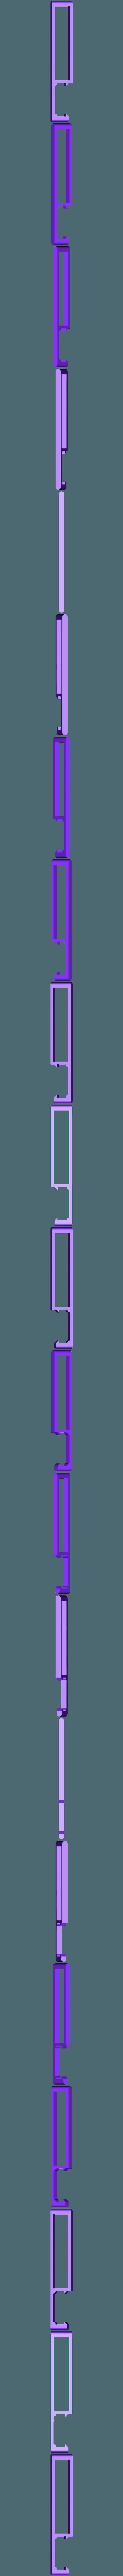 Timeshift-HDD-Halterung.stl Download free STL file Mount for Timeshift-HDD • 3D printer object, dede67